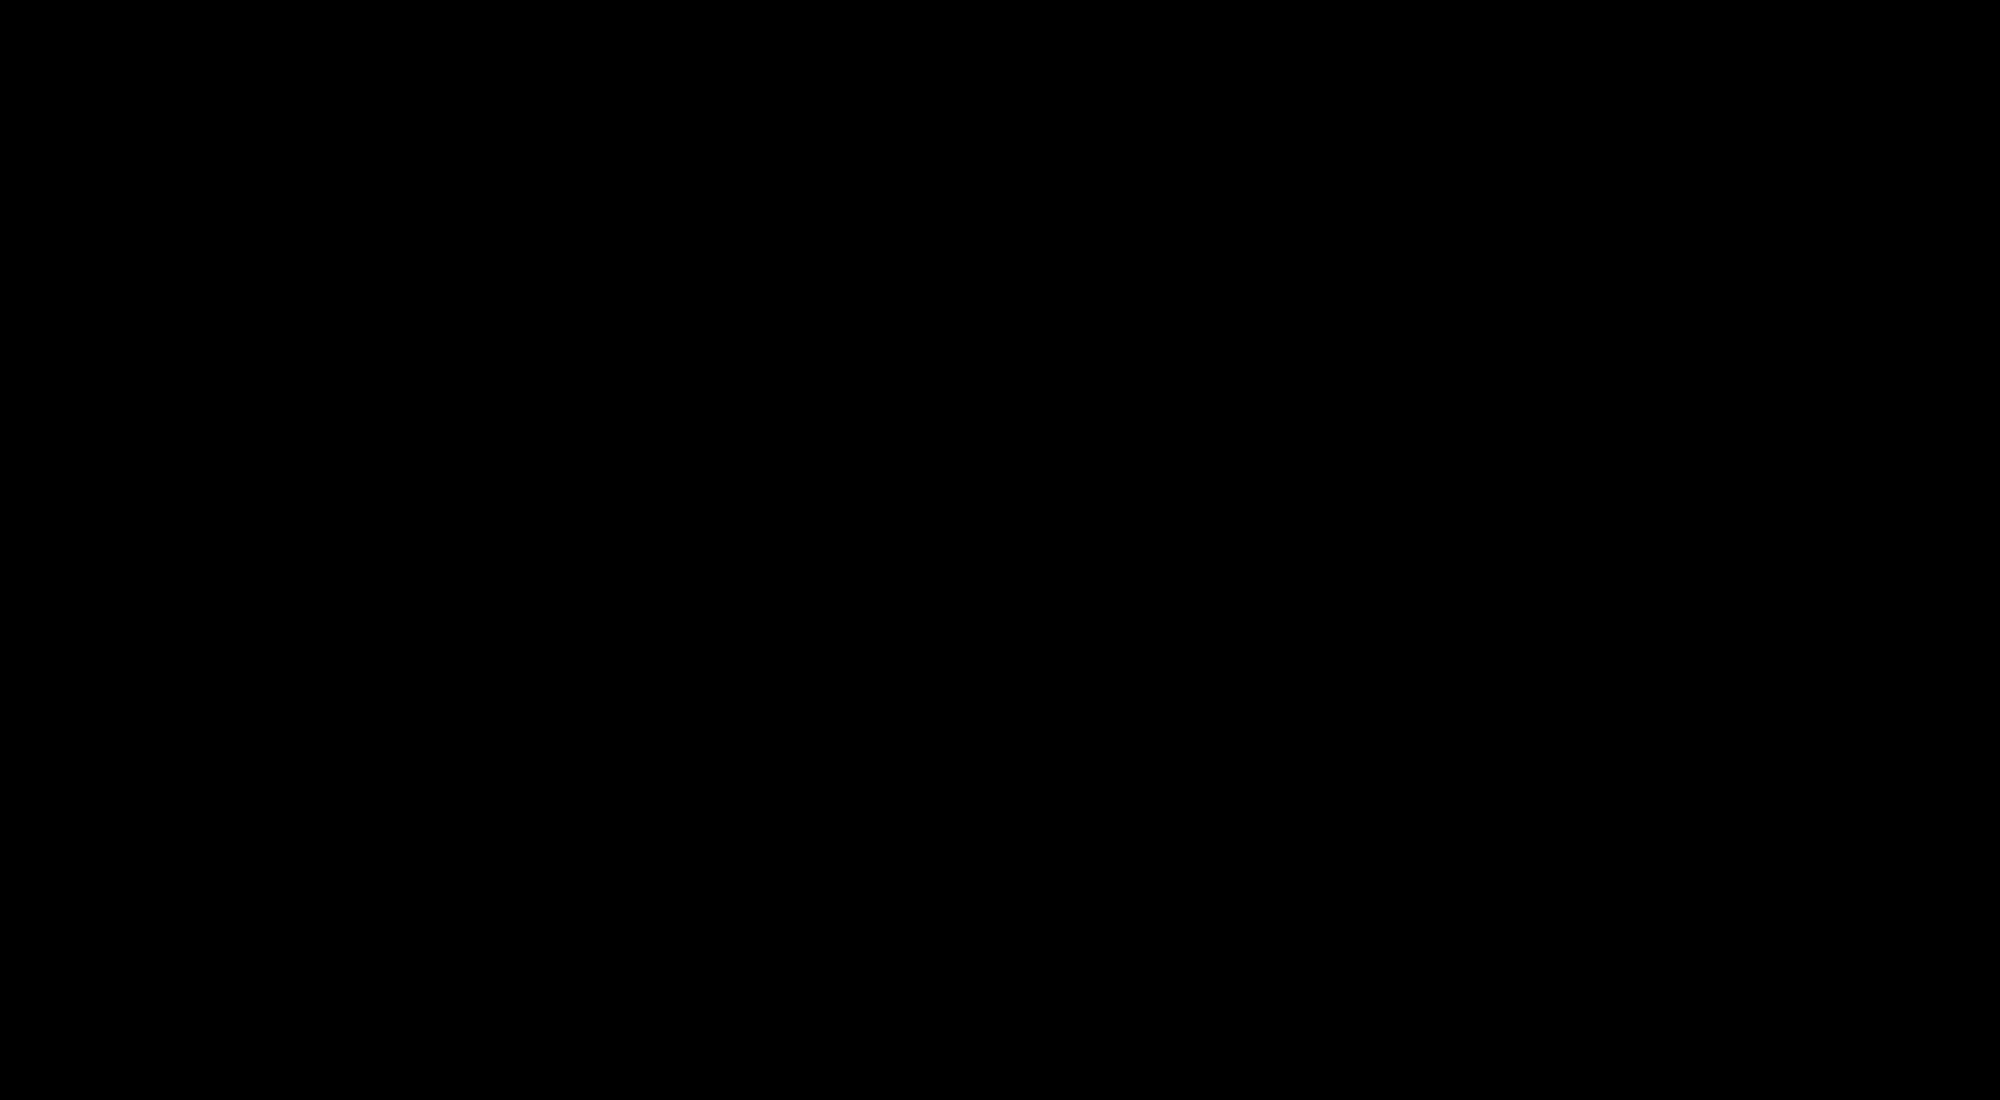 PARAVEL geometry logo - dark logo:transparent background.png